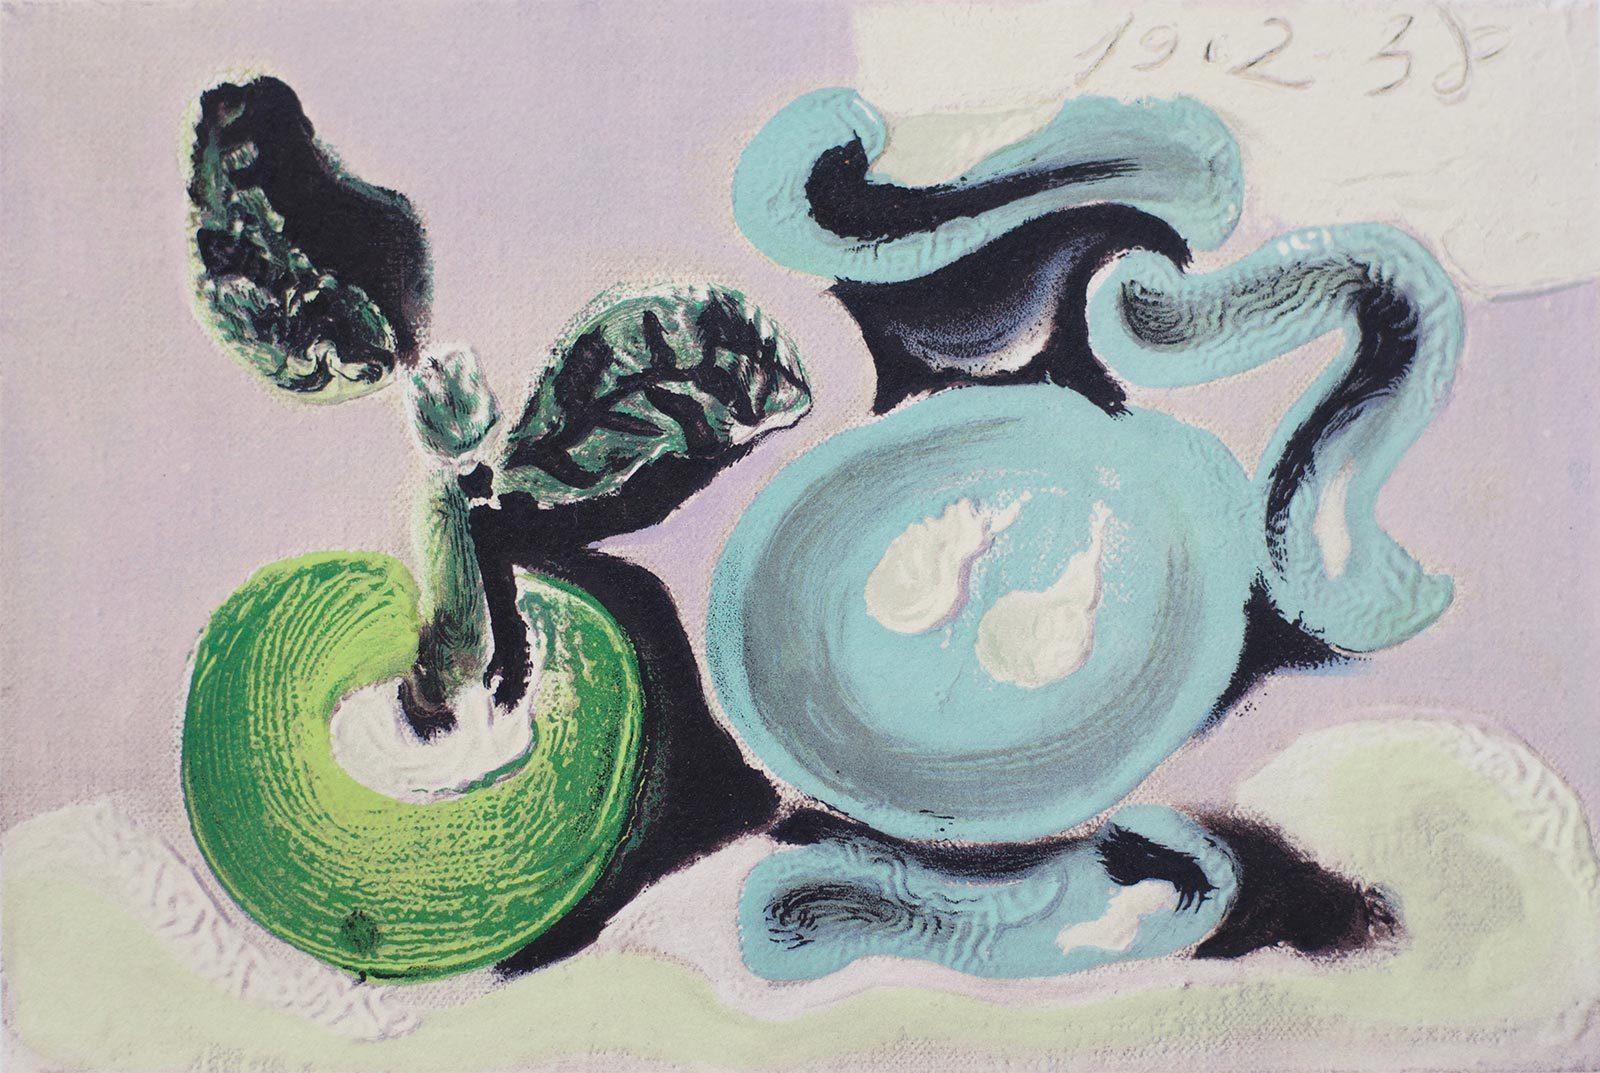 PICASSO E' NOTO Dans l'Atelier de Picasso 1957 Nature Morte au Pichet 19-02-1938